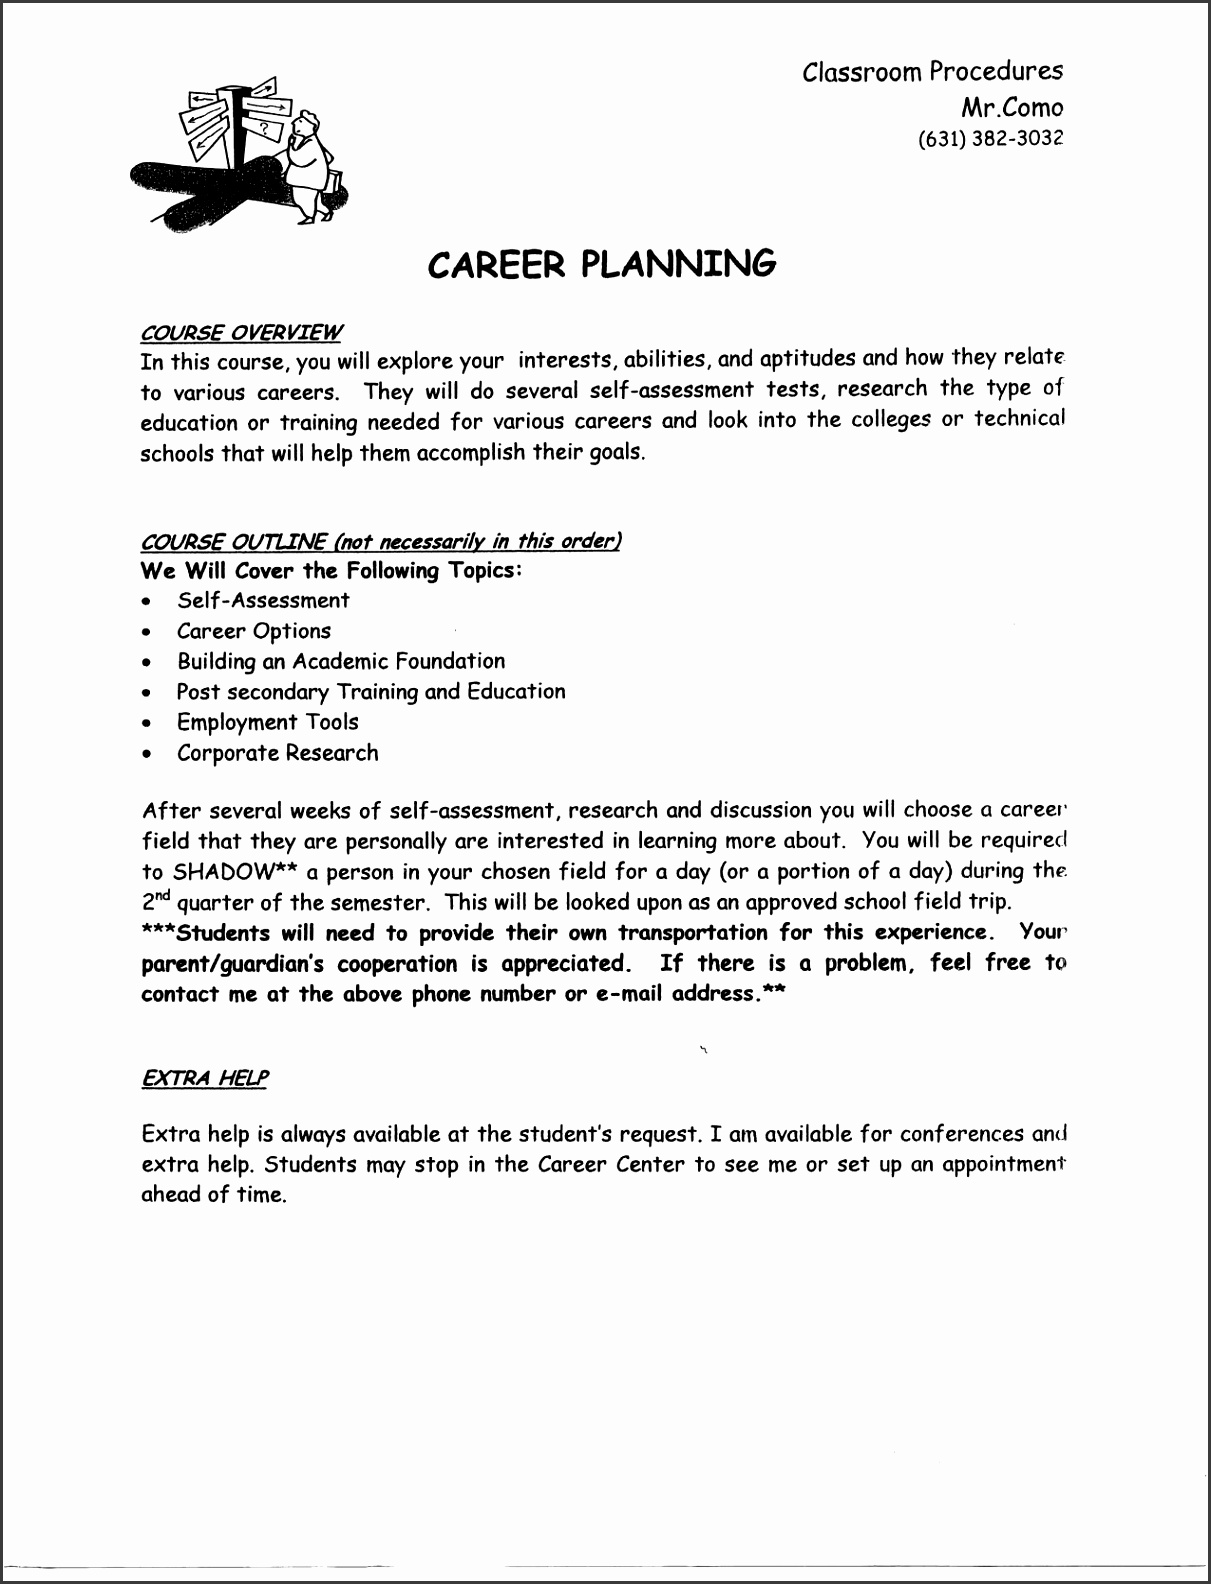 career plan essay career plan after graduation from northumbria career planning essay doit my ip meessay